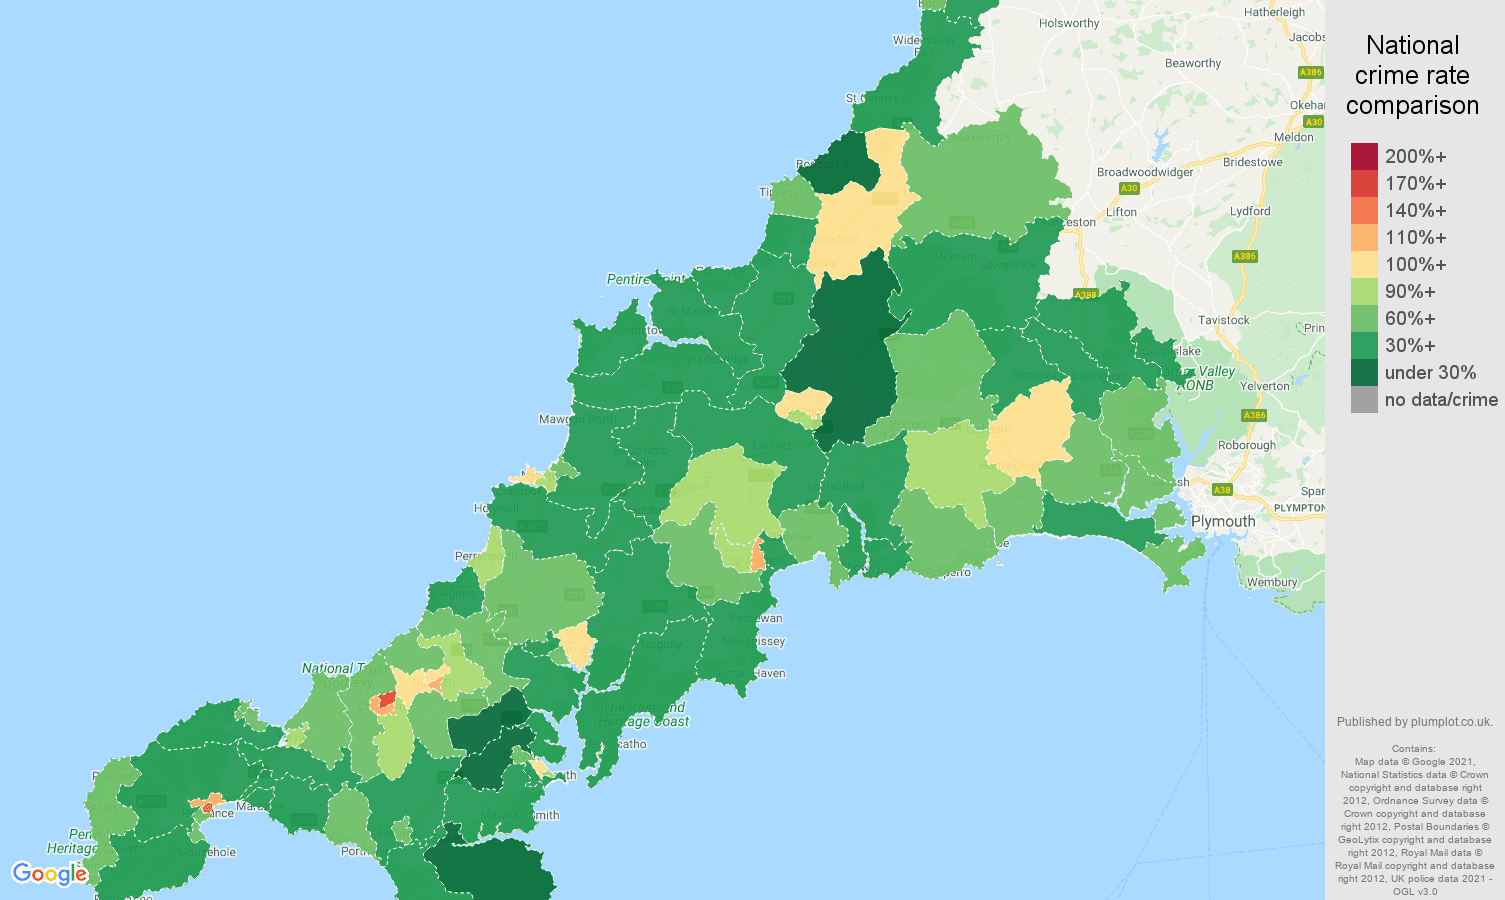 Cornwall violent crime rate comparison map